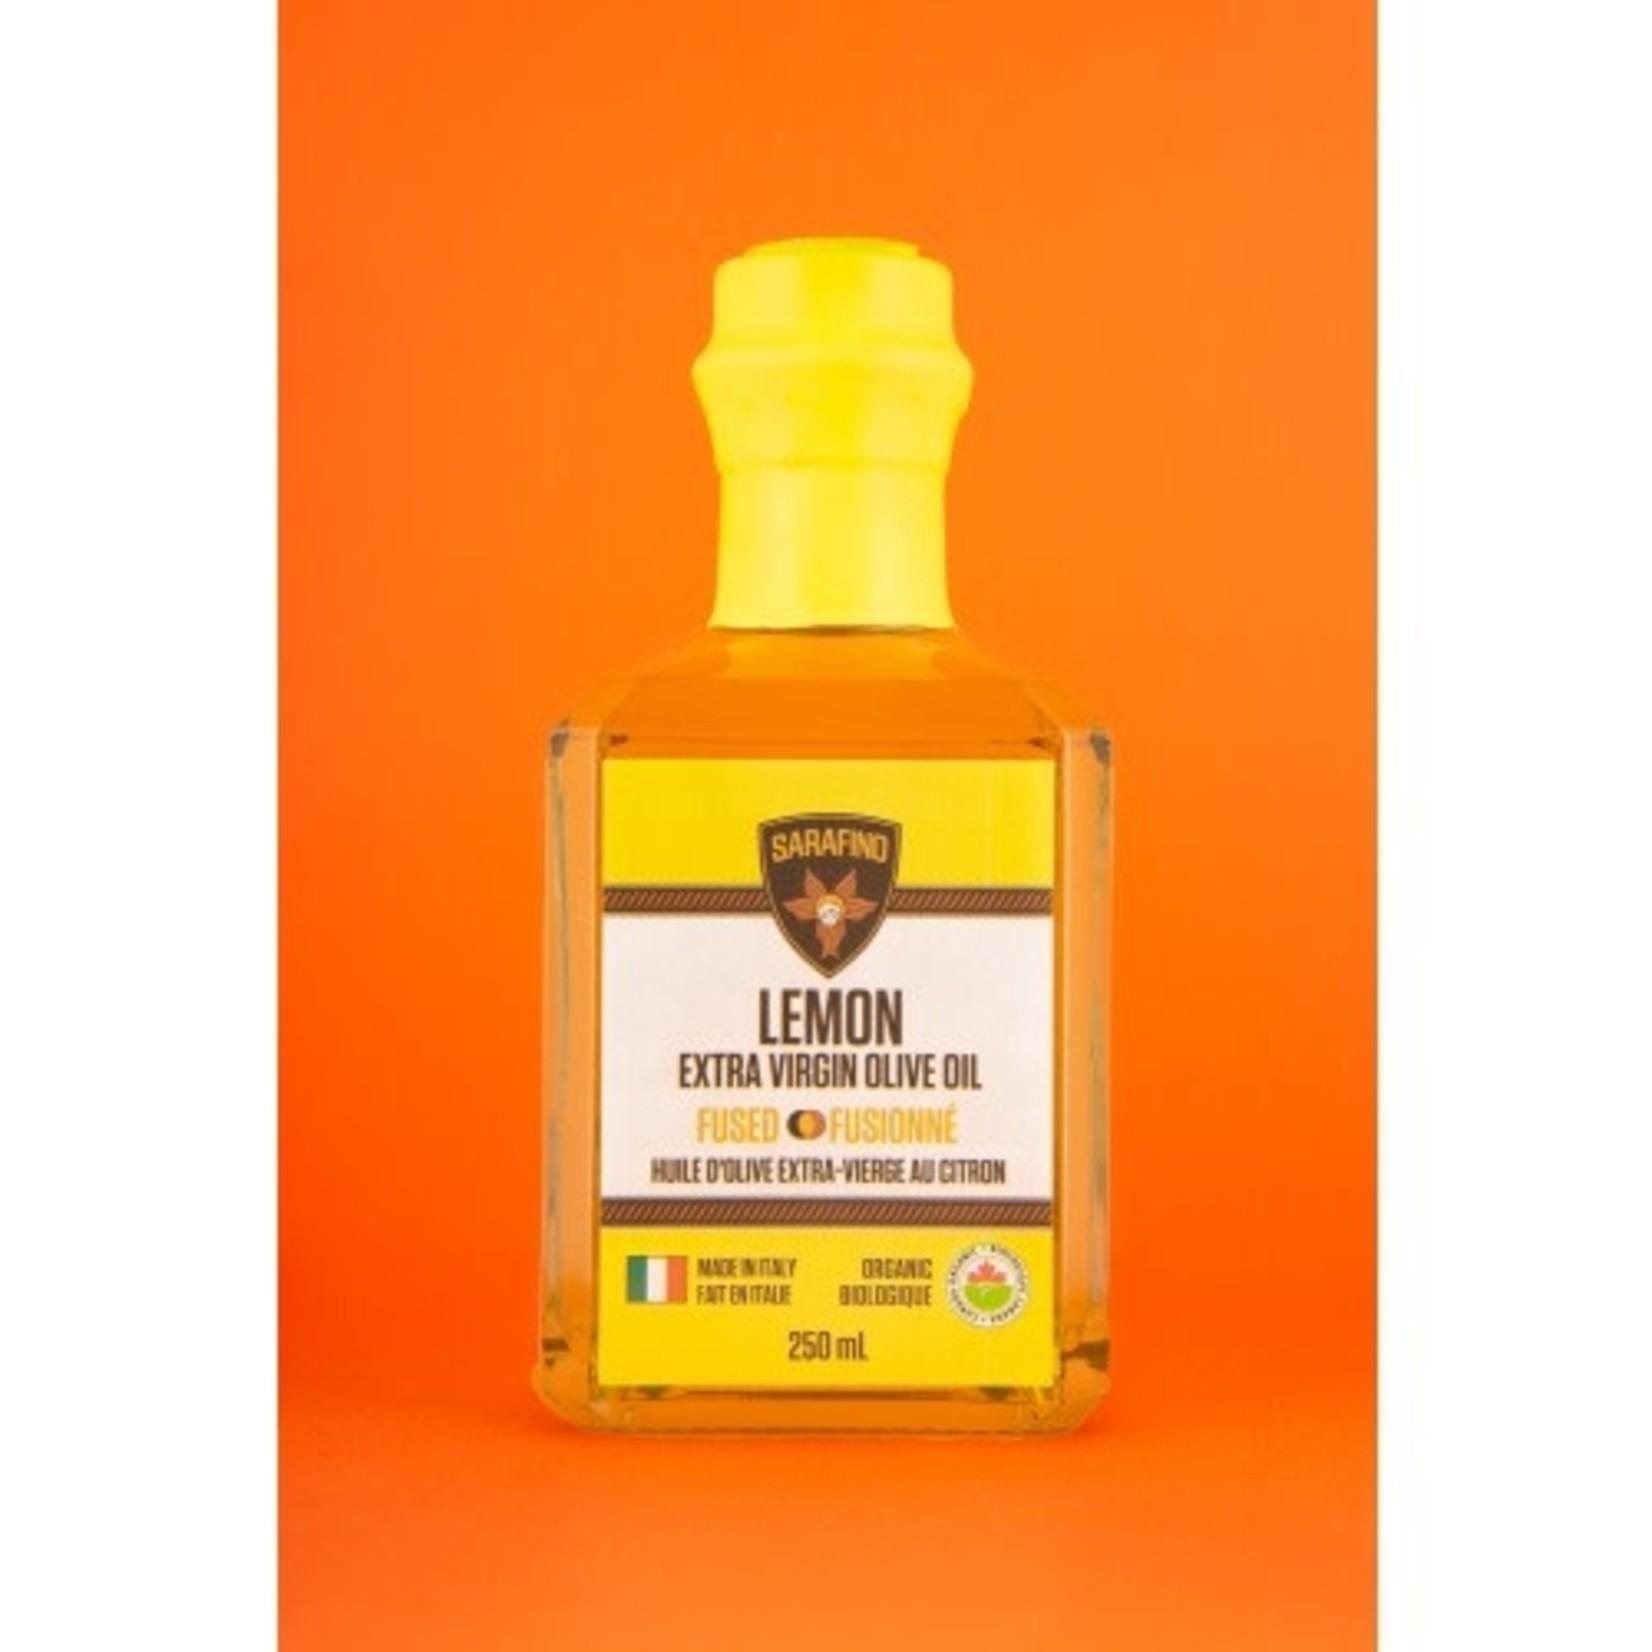 Sarafino Inc. Organic Lemon Fused EVOO 250ml